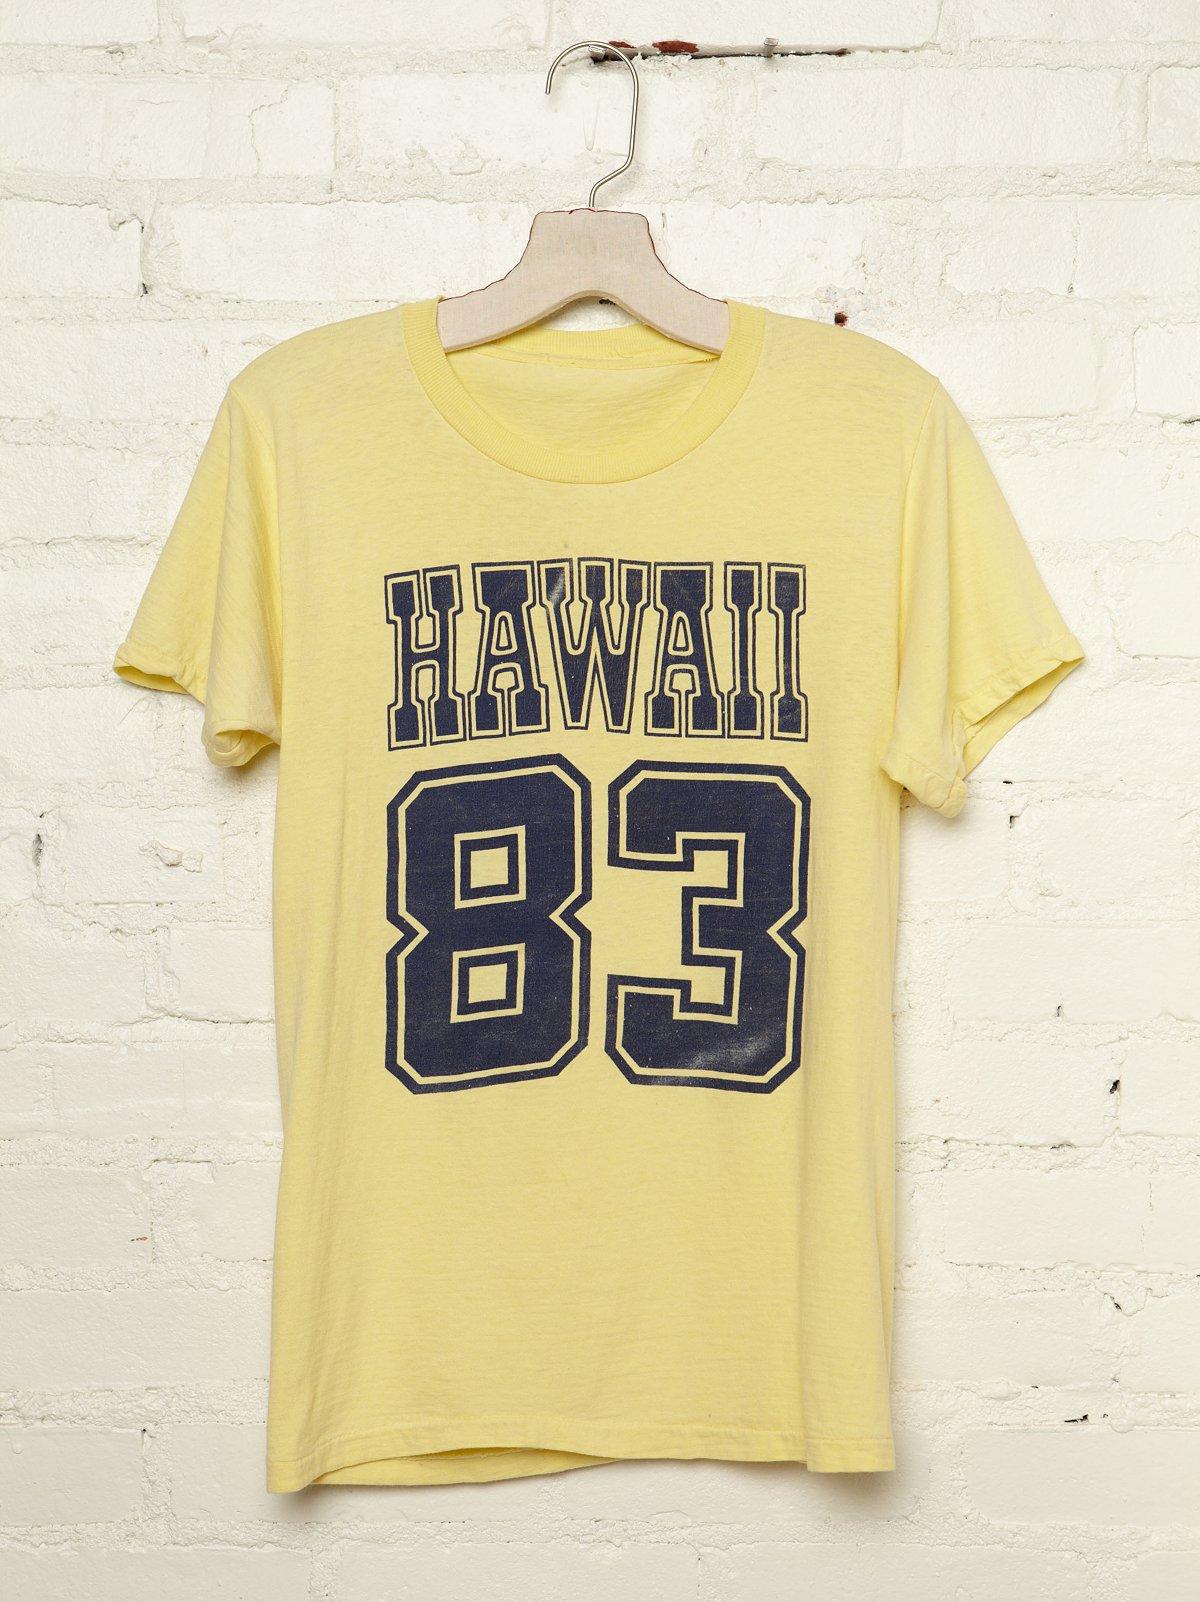 Vintage Hawaii 83 Tee